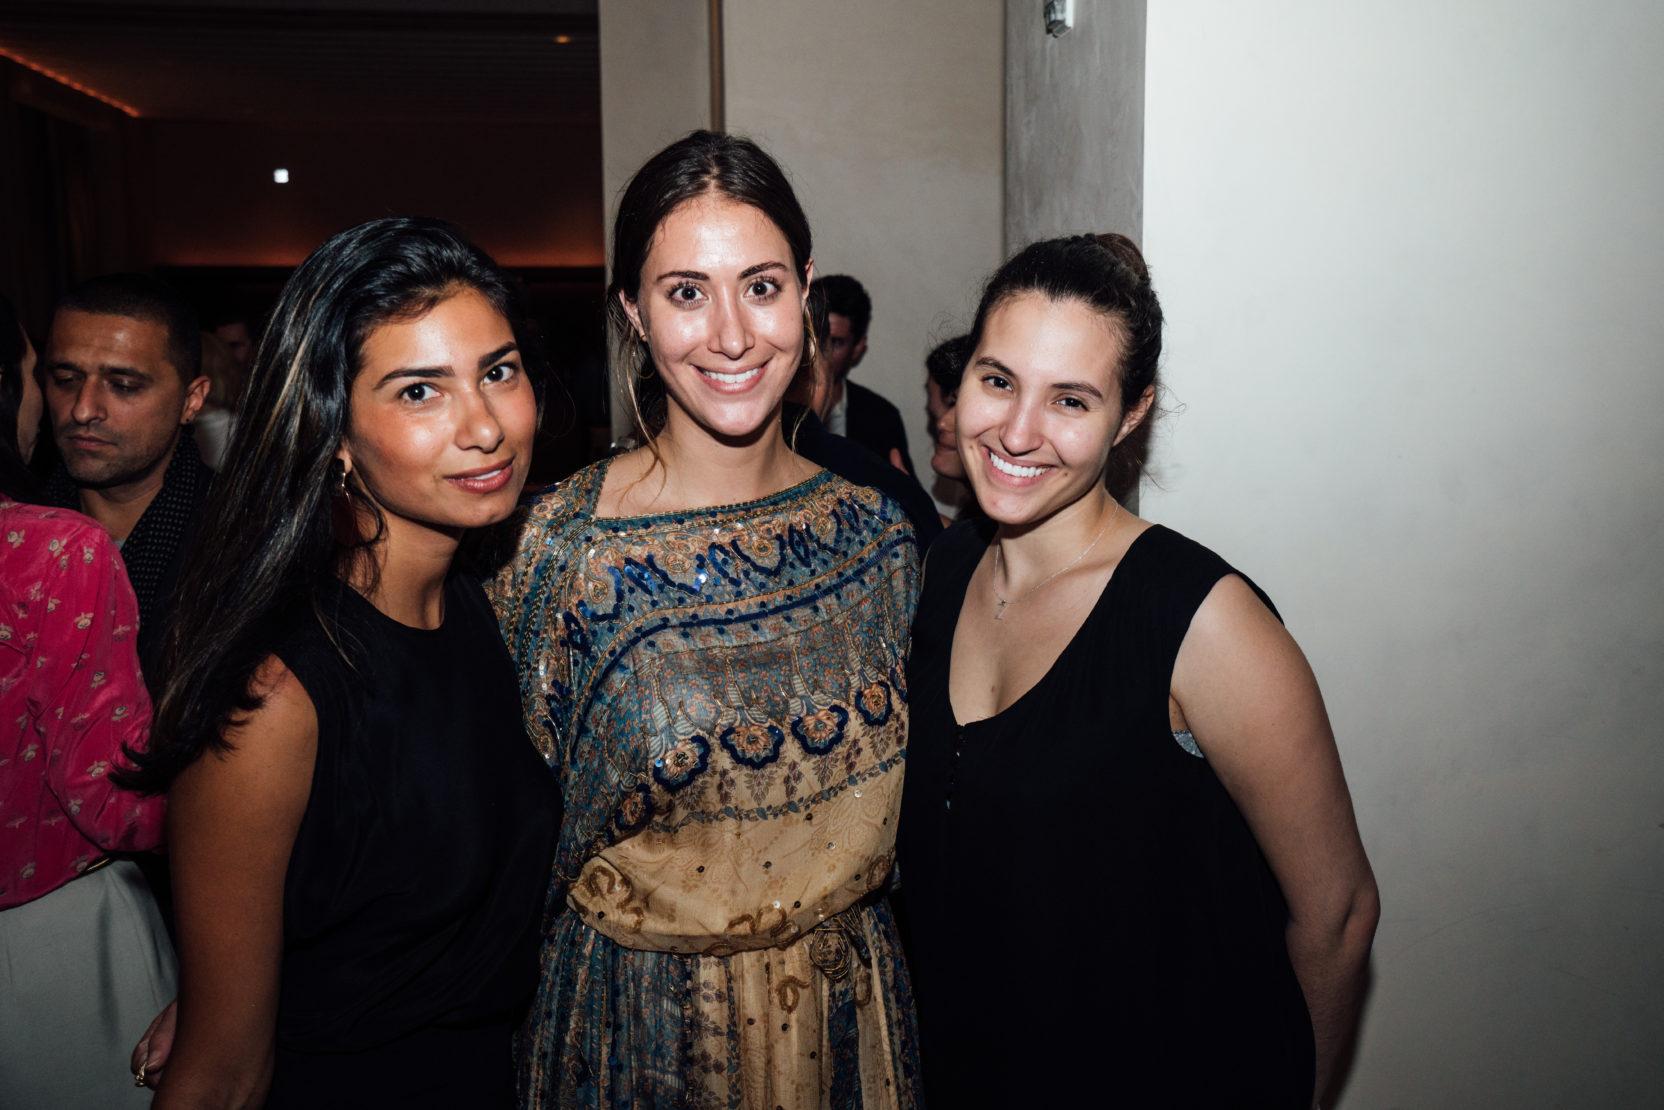 Tania Cavallo, Liza Hyman and Sophia Schrager